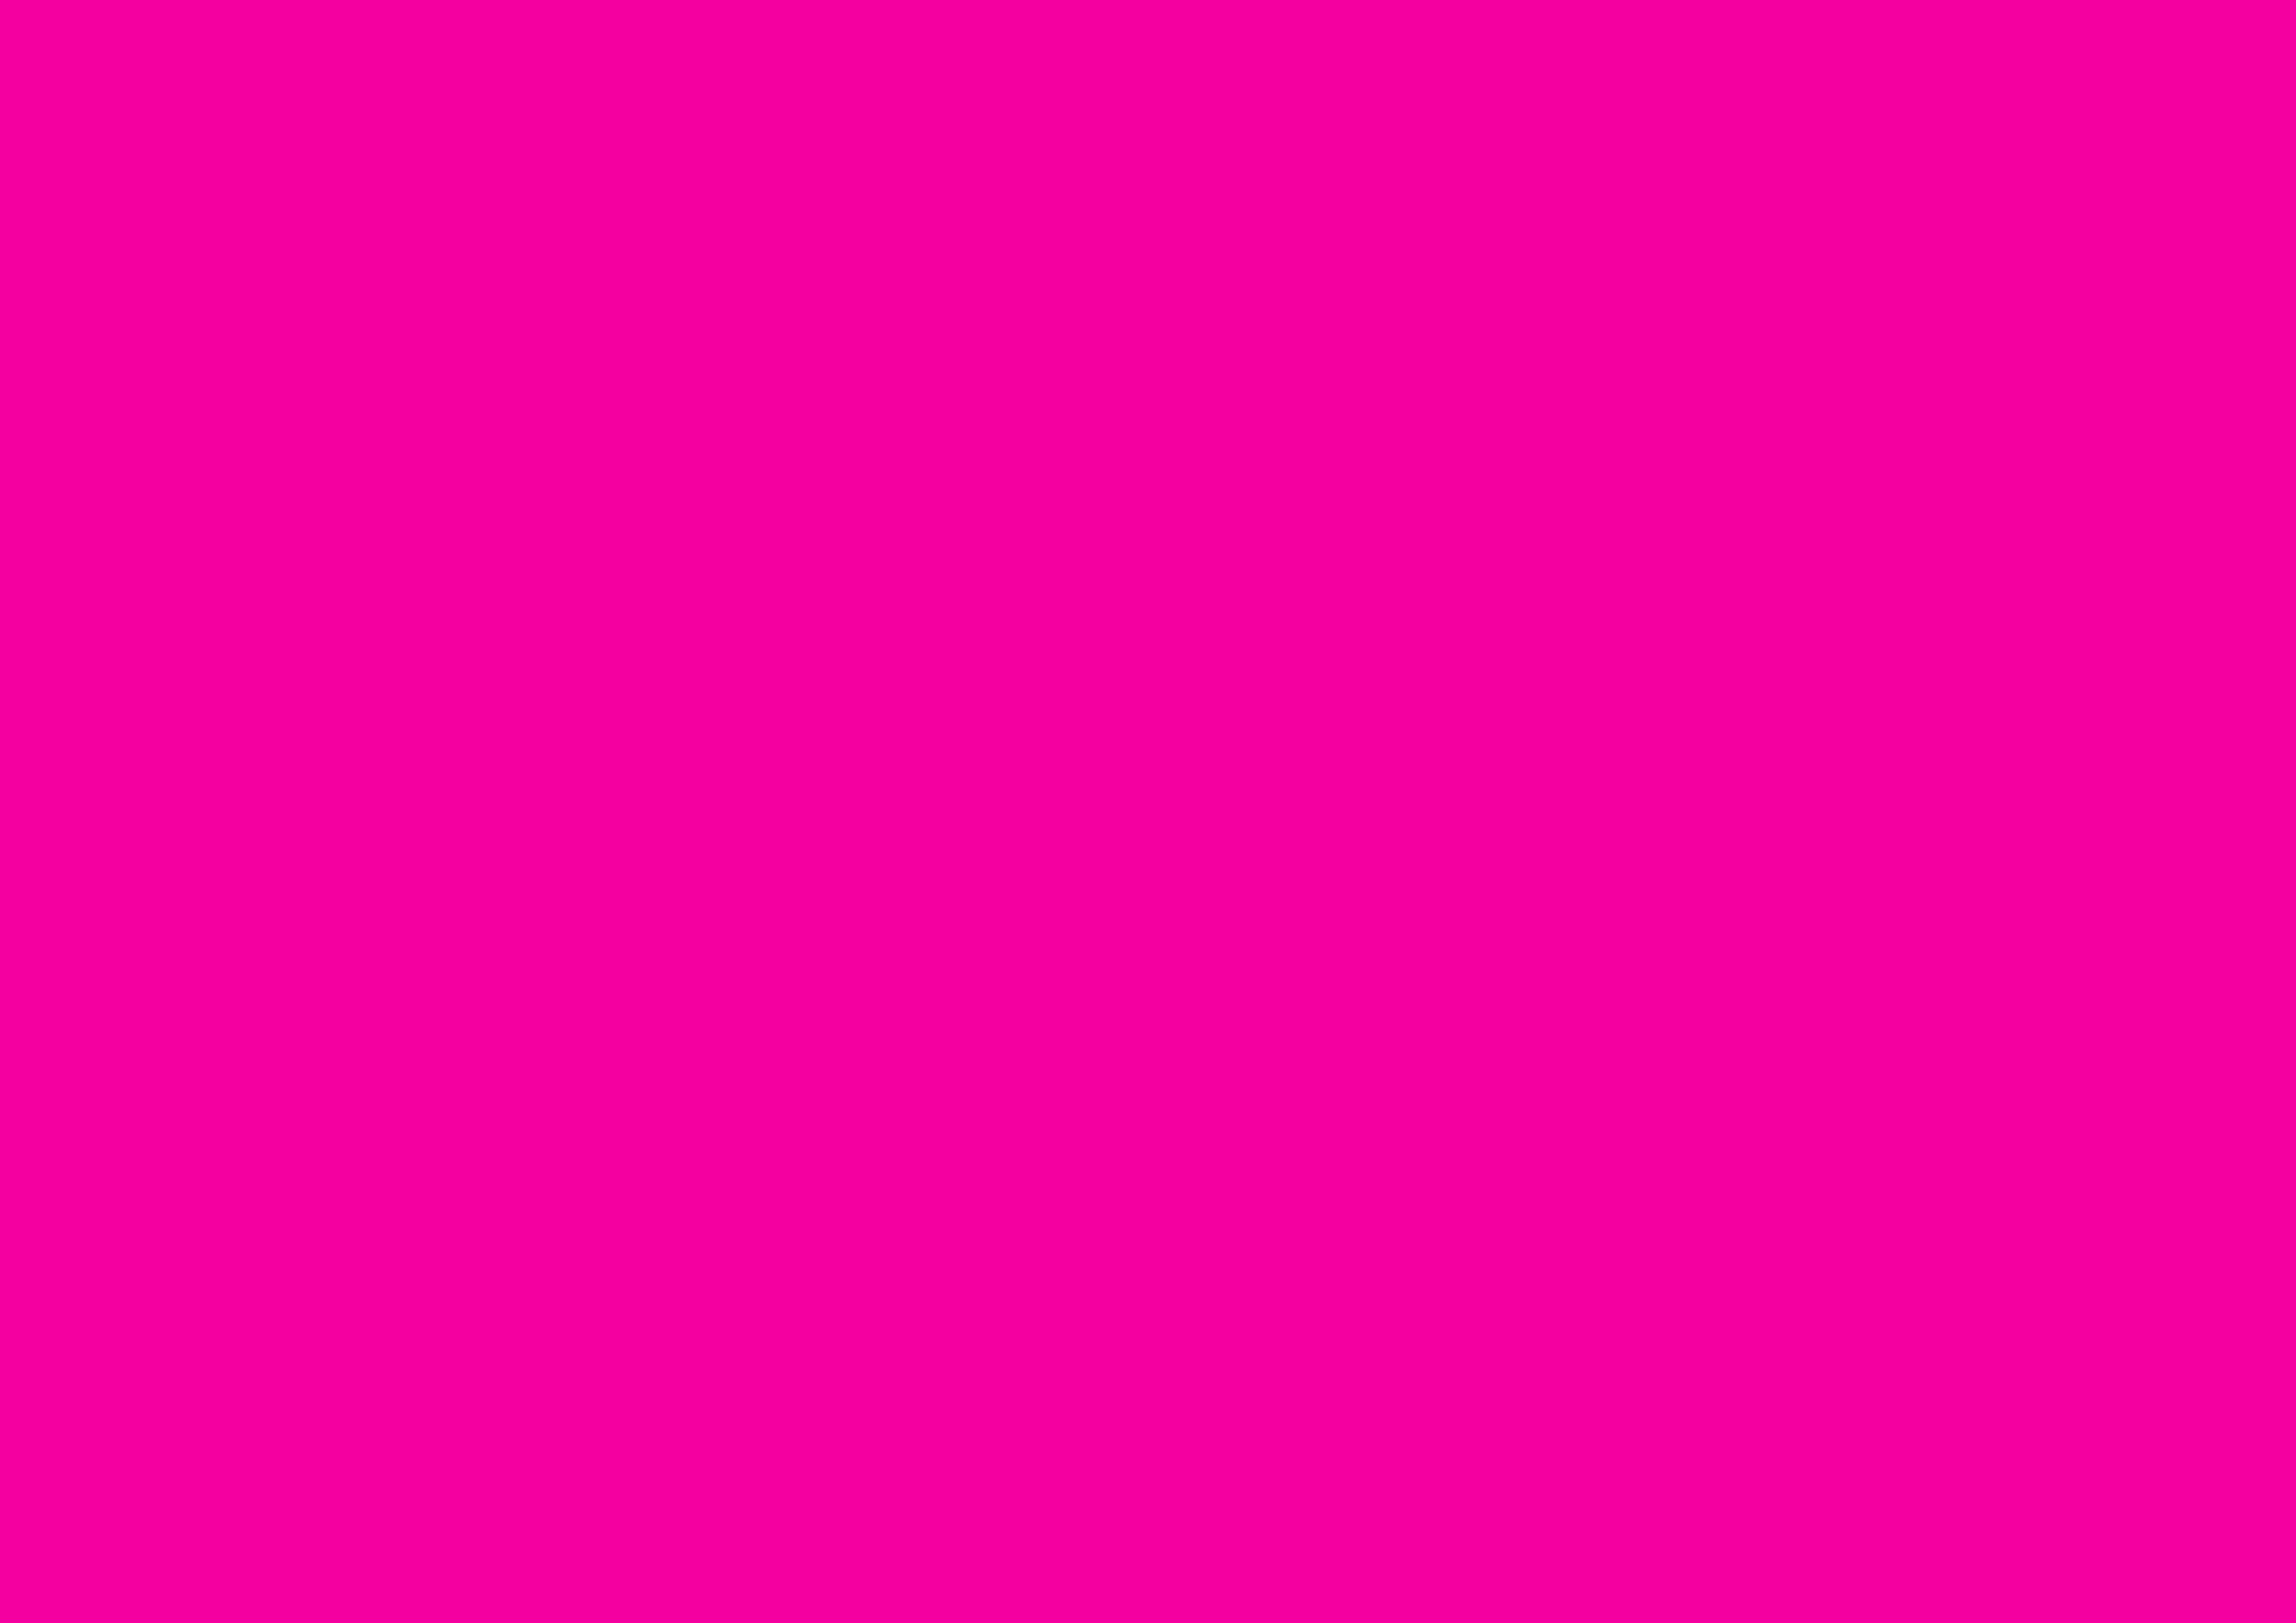 3508x2480 Fashion Fuchsia Solid Color Background